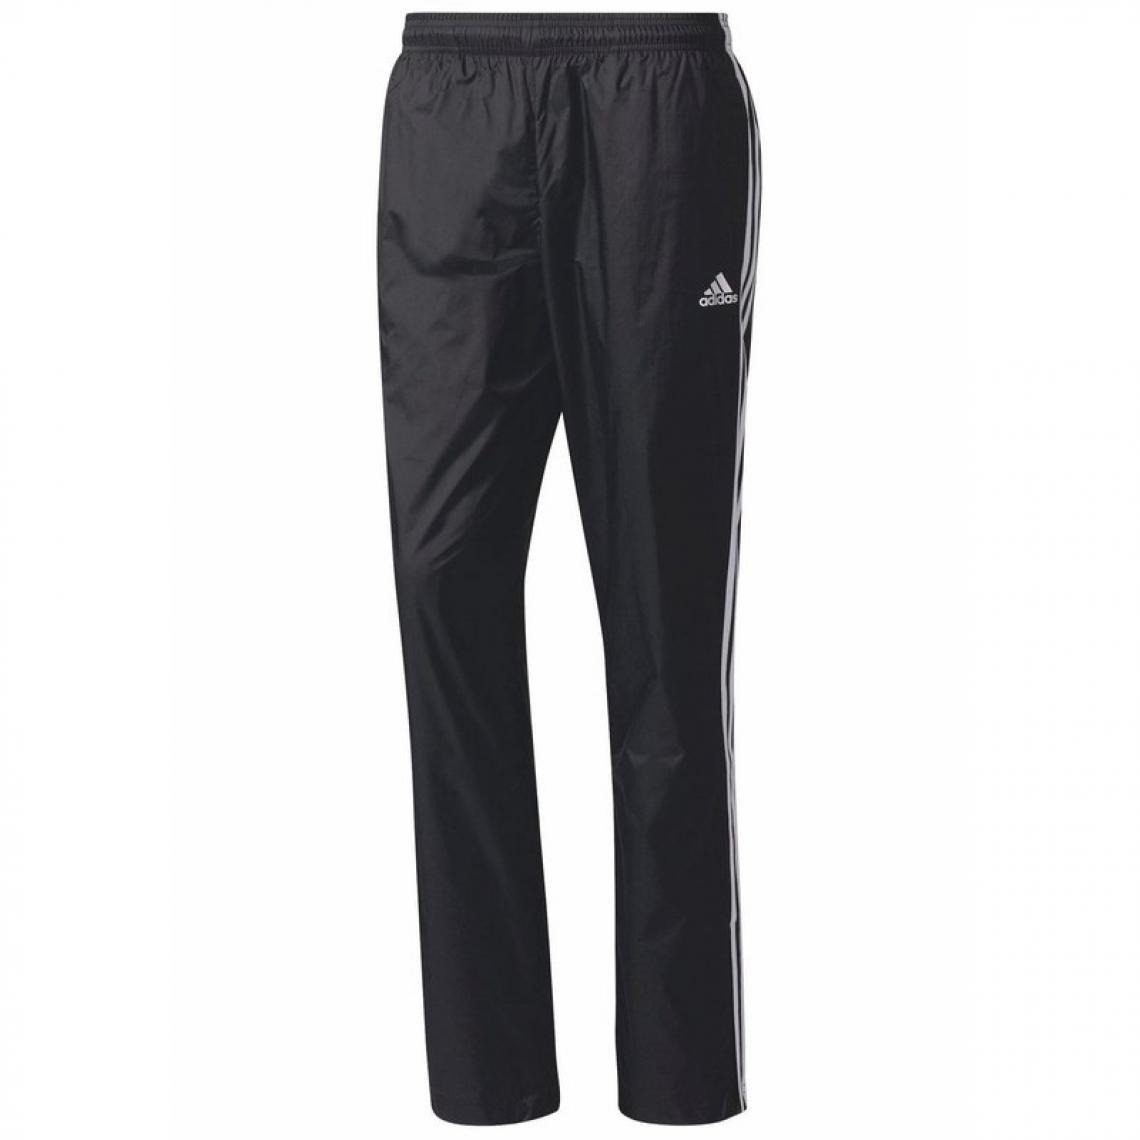 bba757bec70 Pantalon de jogging homme Essentials 3 Stripes adidas Performance Adidas  Performance GENERIQUE